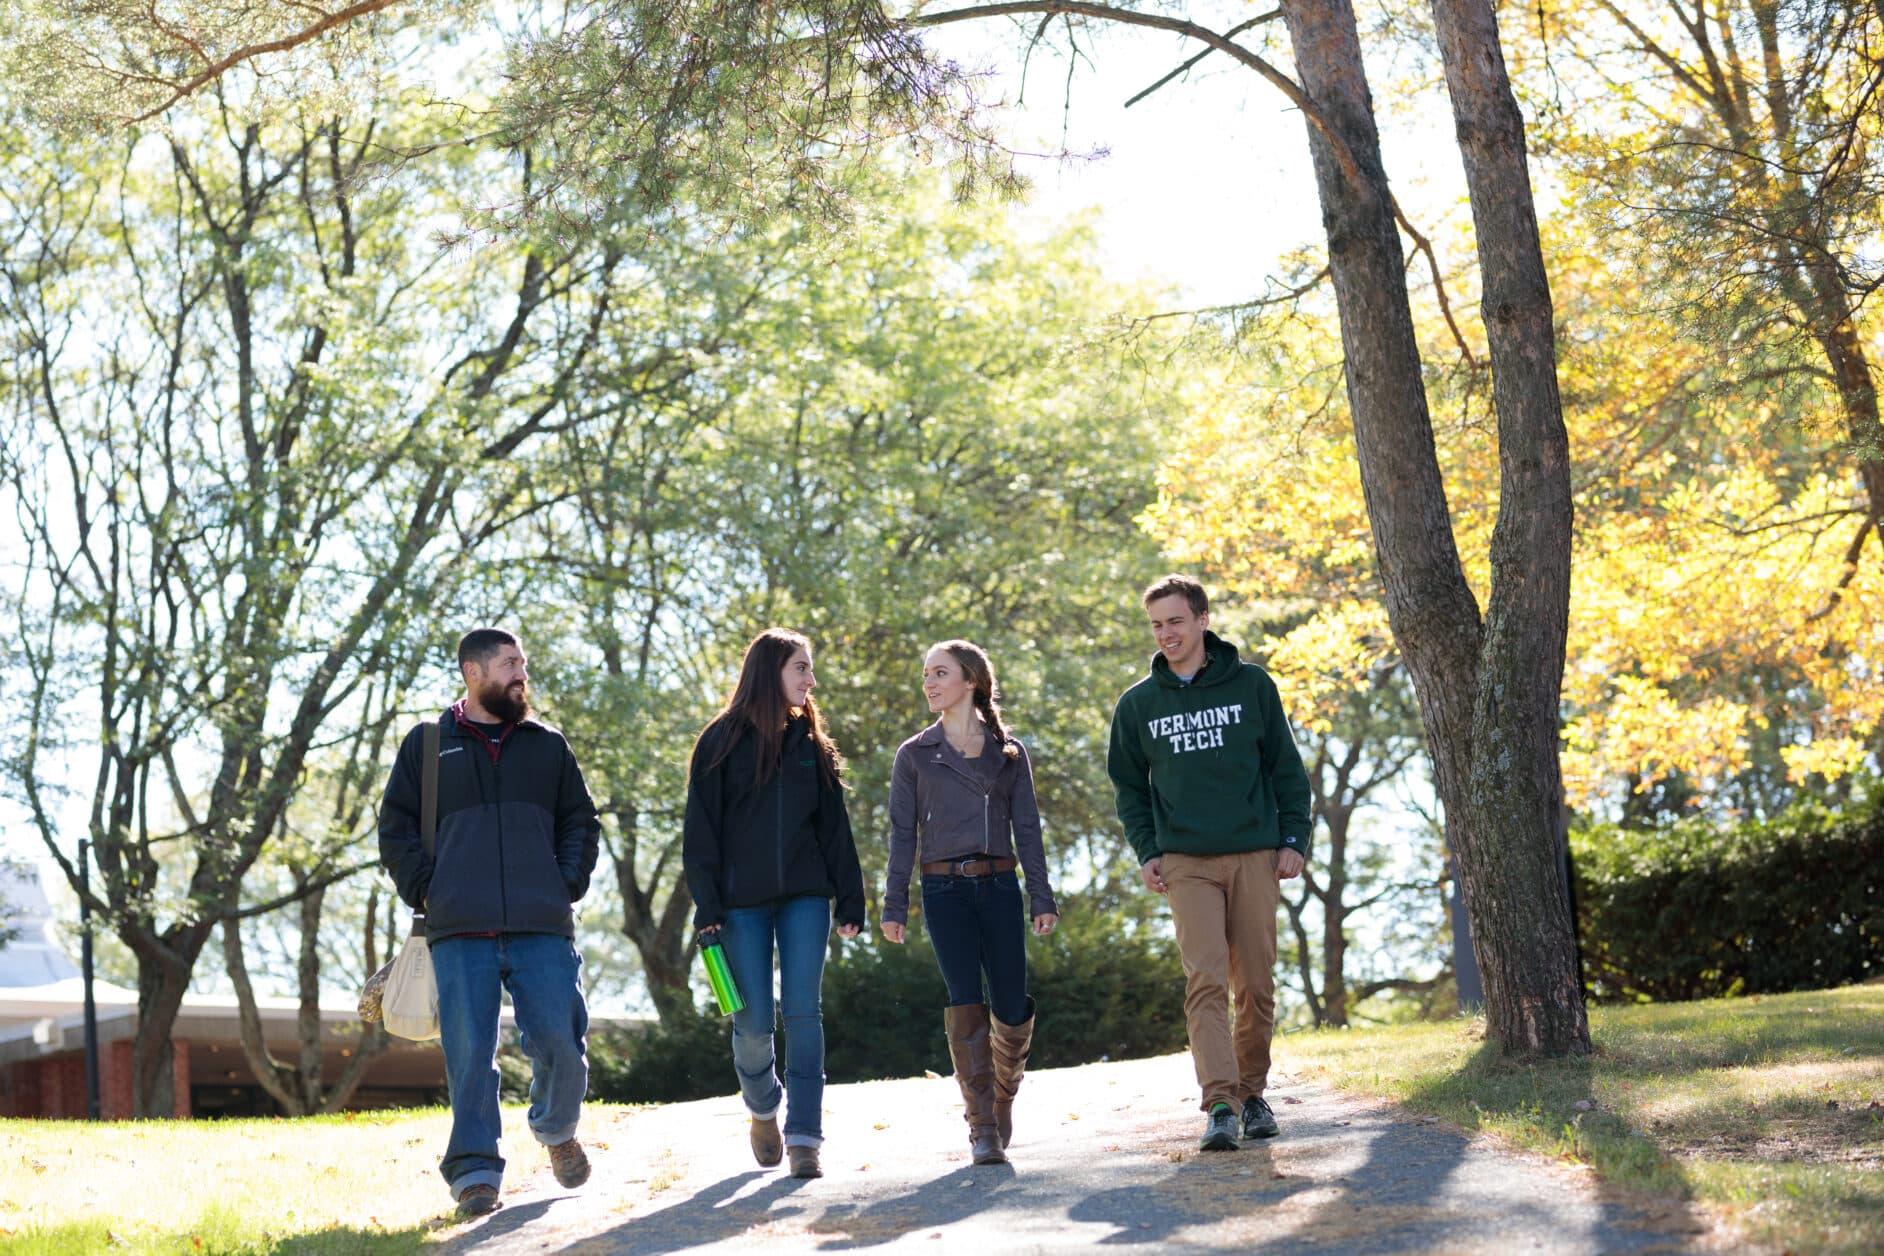 Students walking on Randolph Center campus; sunshine; happy